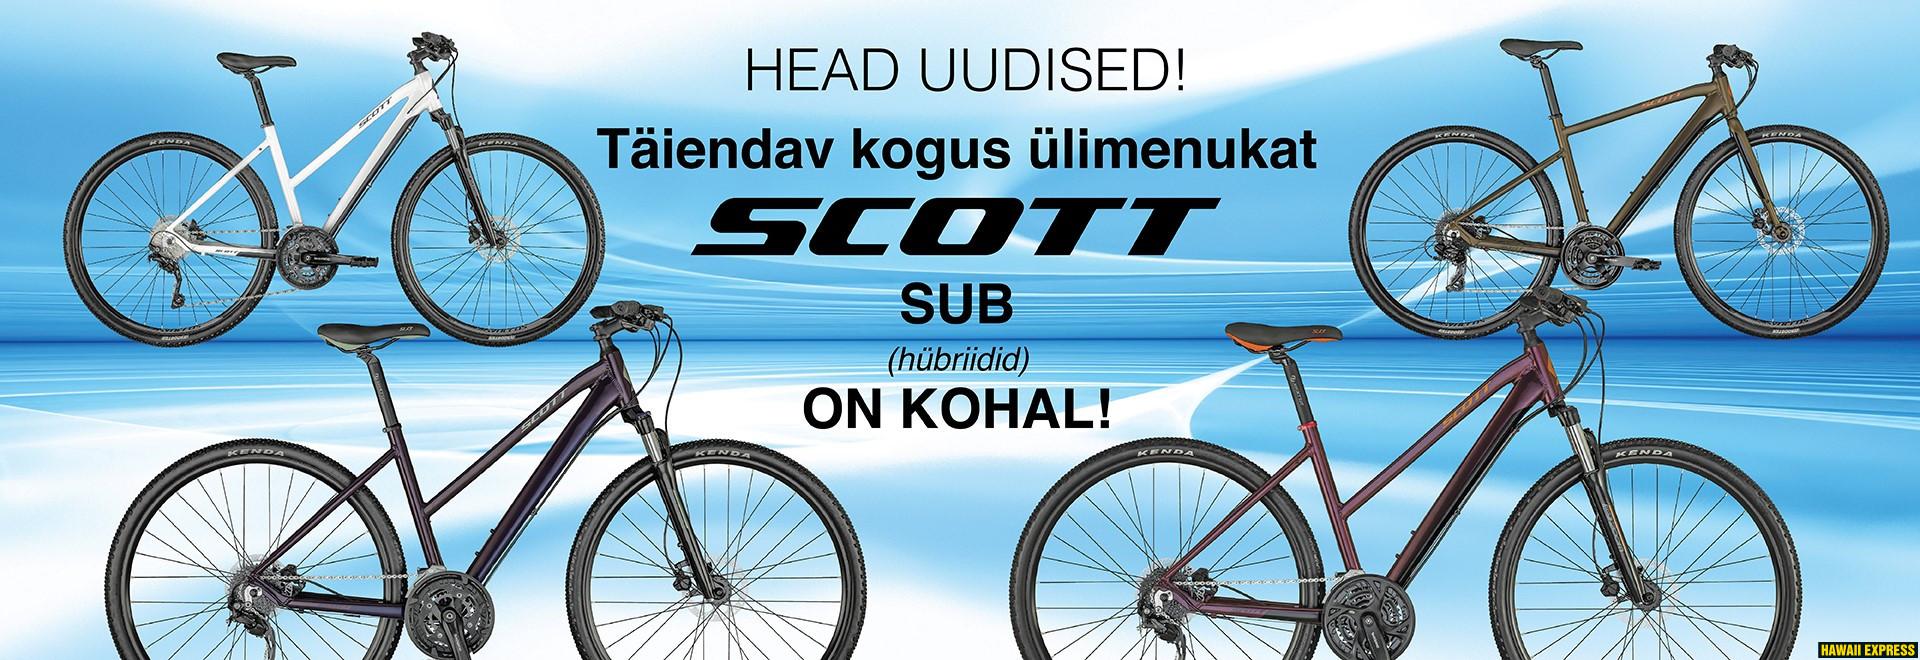 Scott_sub